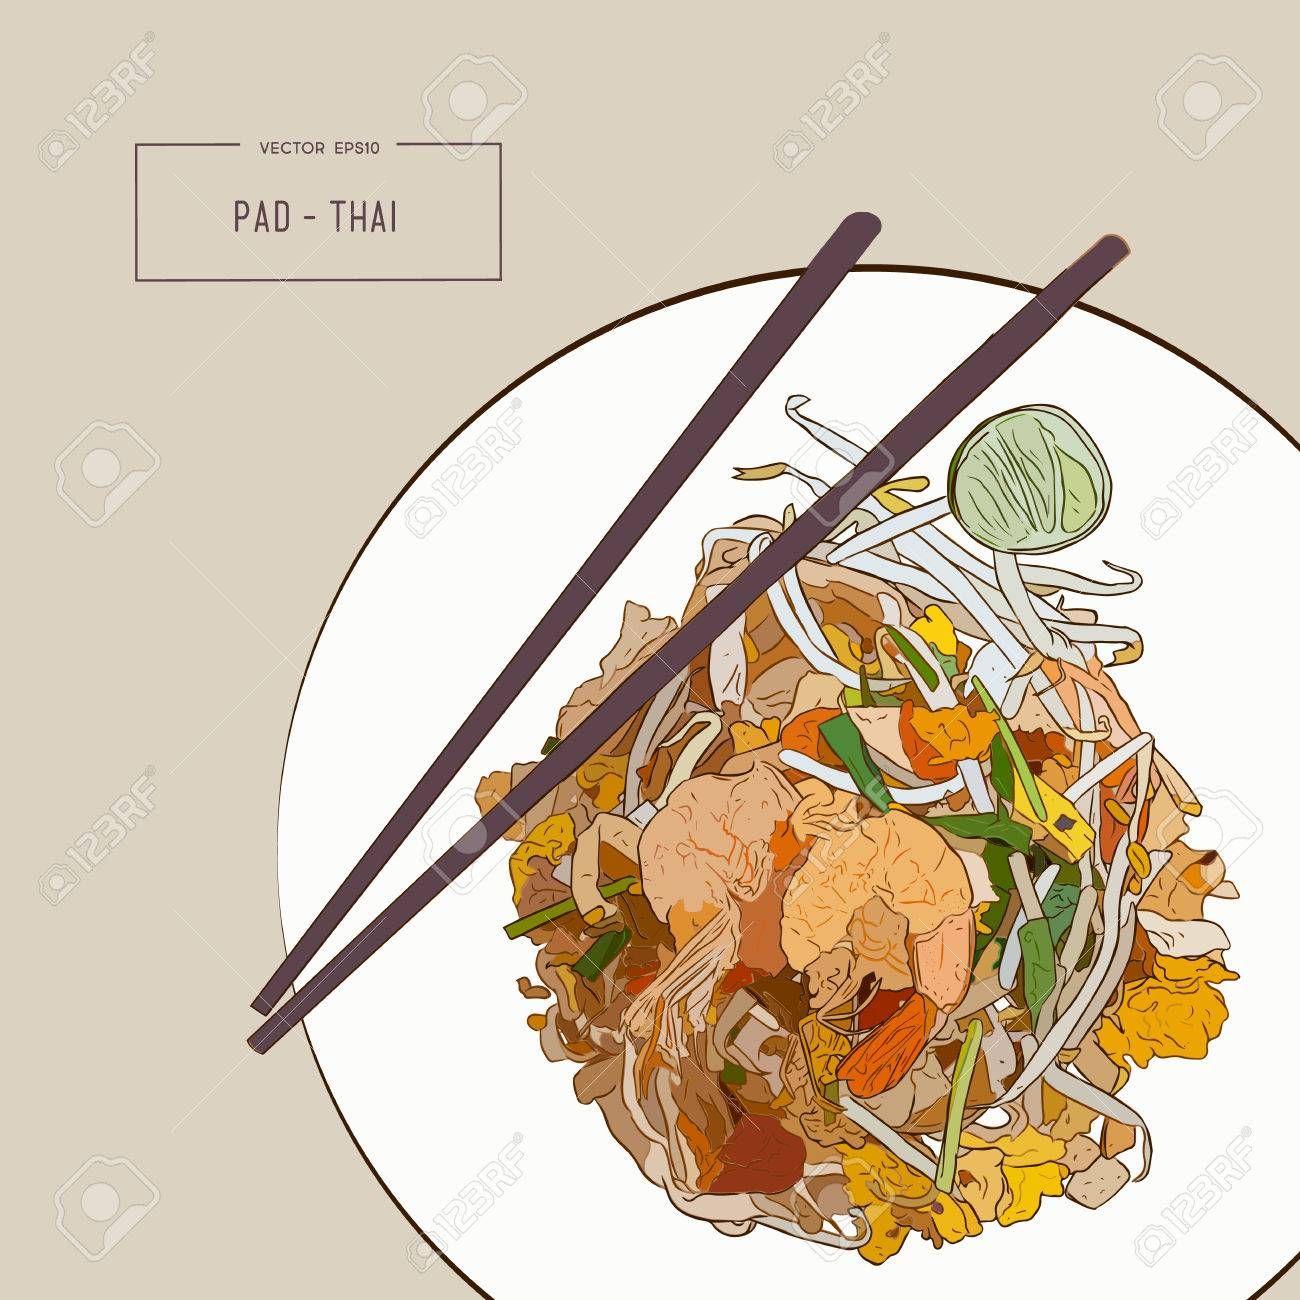 Pat Thai Stir Fried Rice Noodle Local Thailand Food Hand Draw